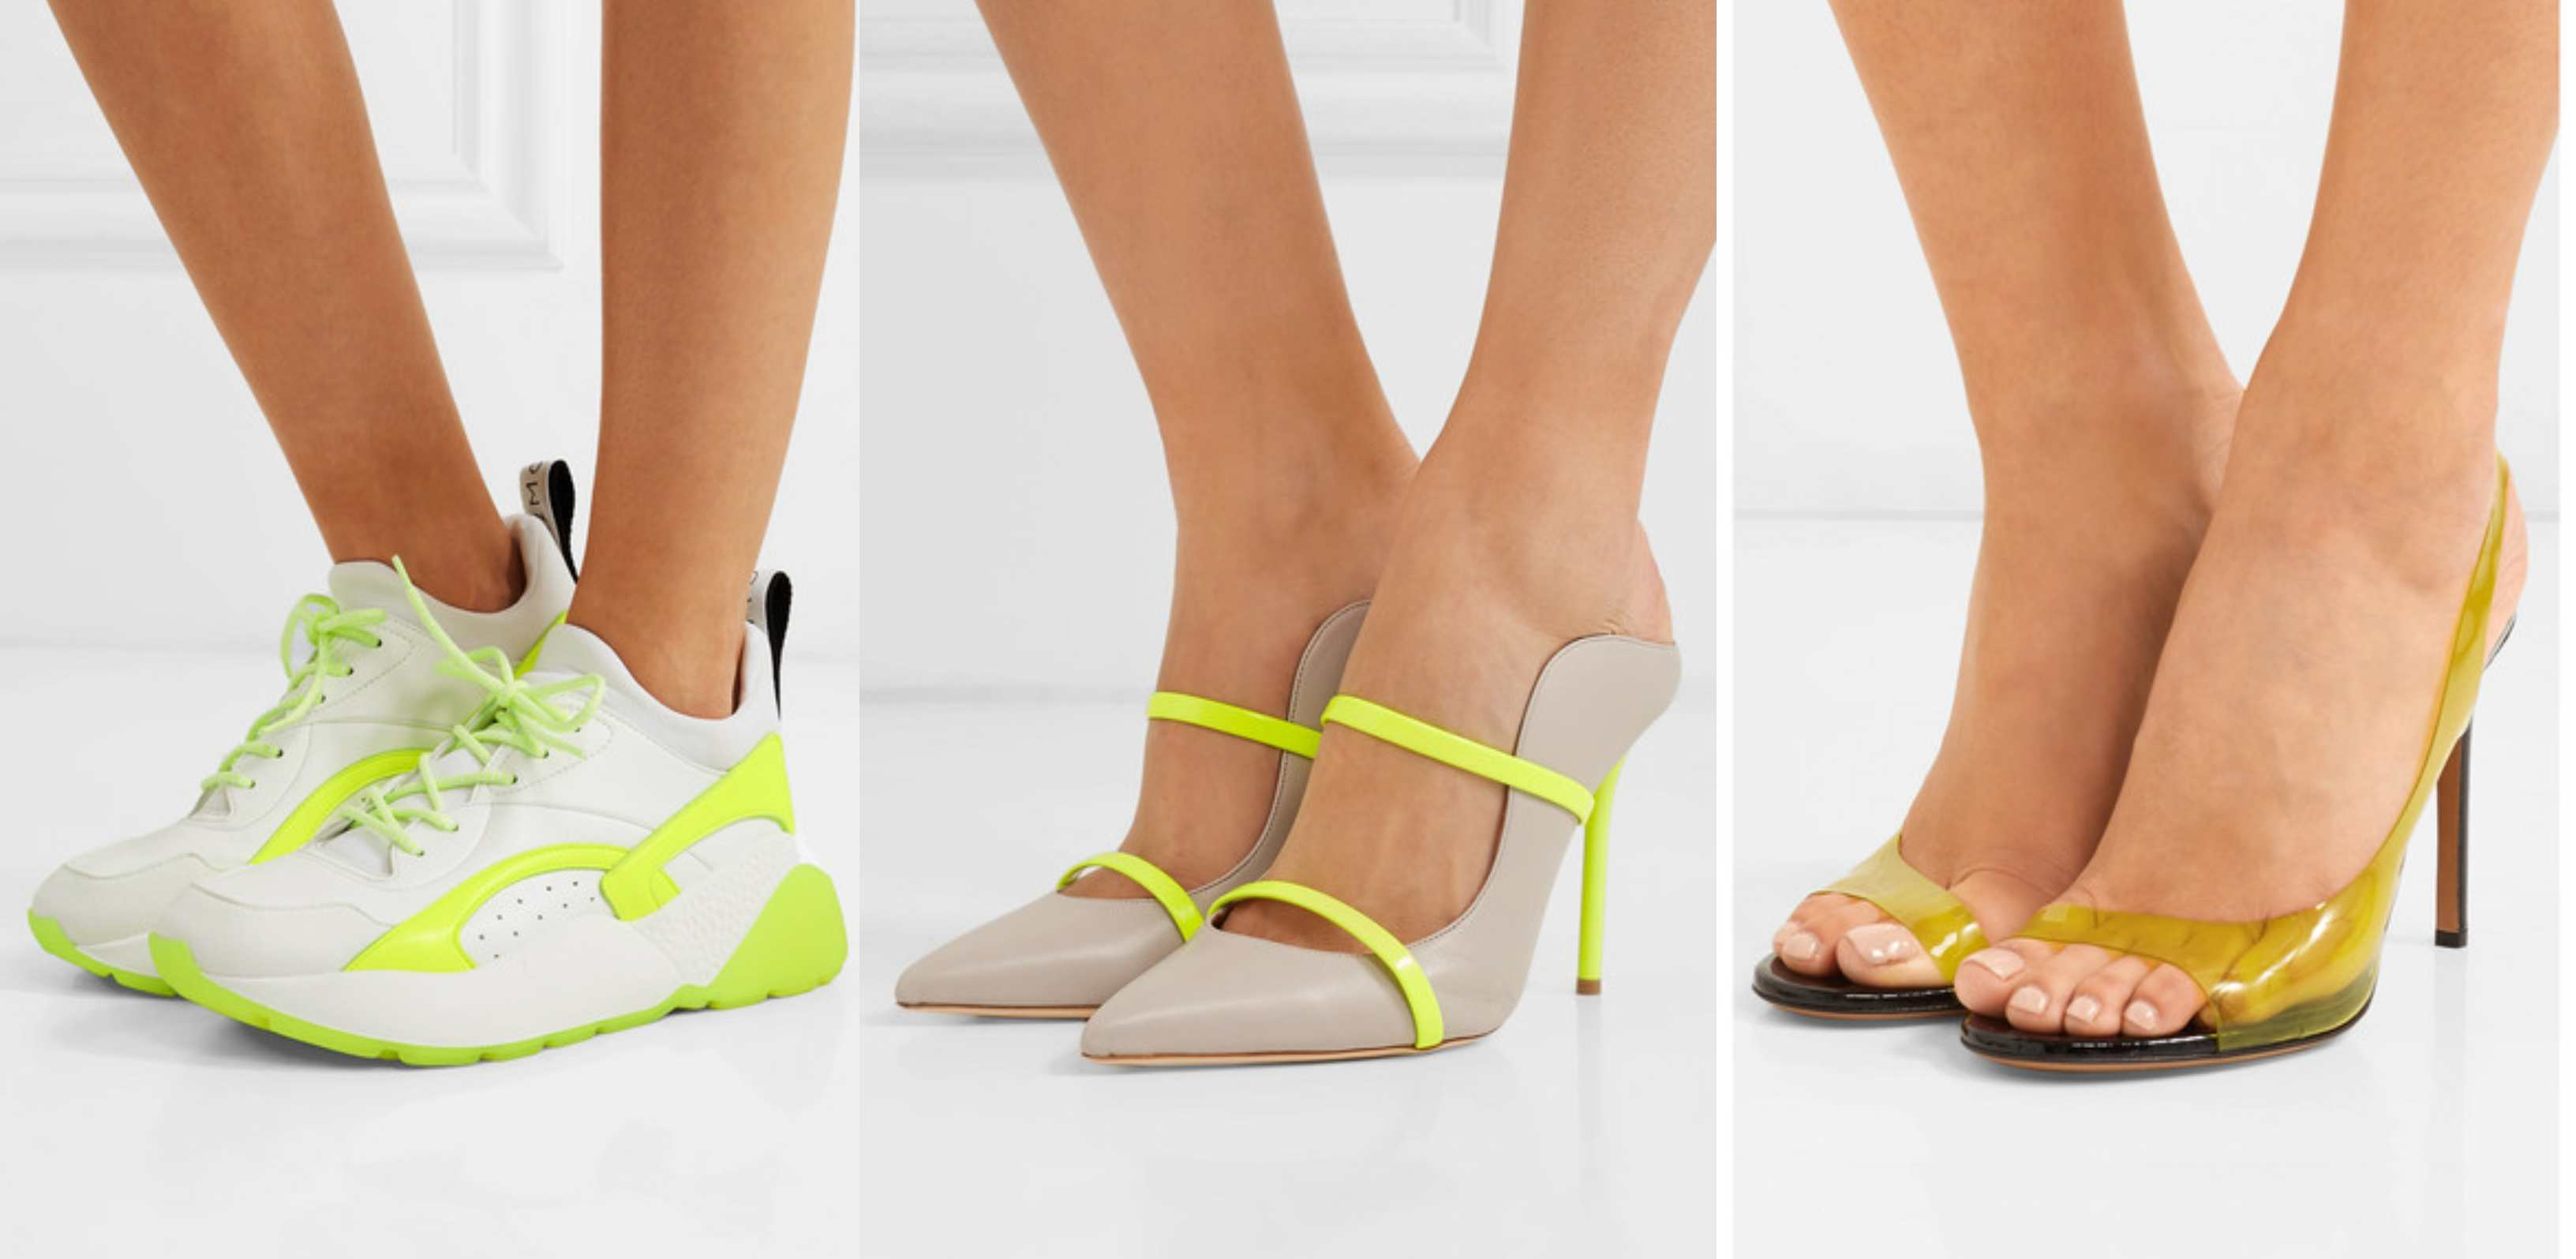 3c84fea95 أحدث صيحات الأحذية هذا الصيف - Lebanon News